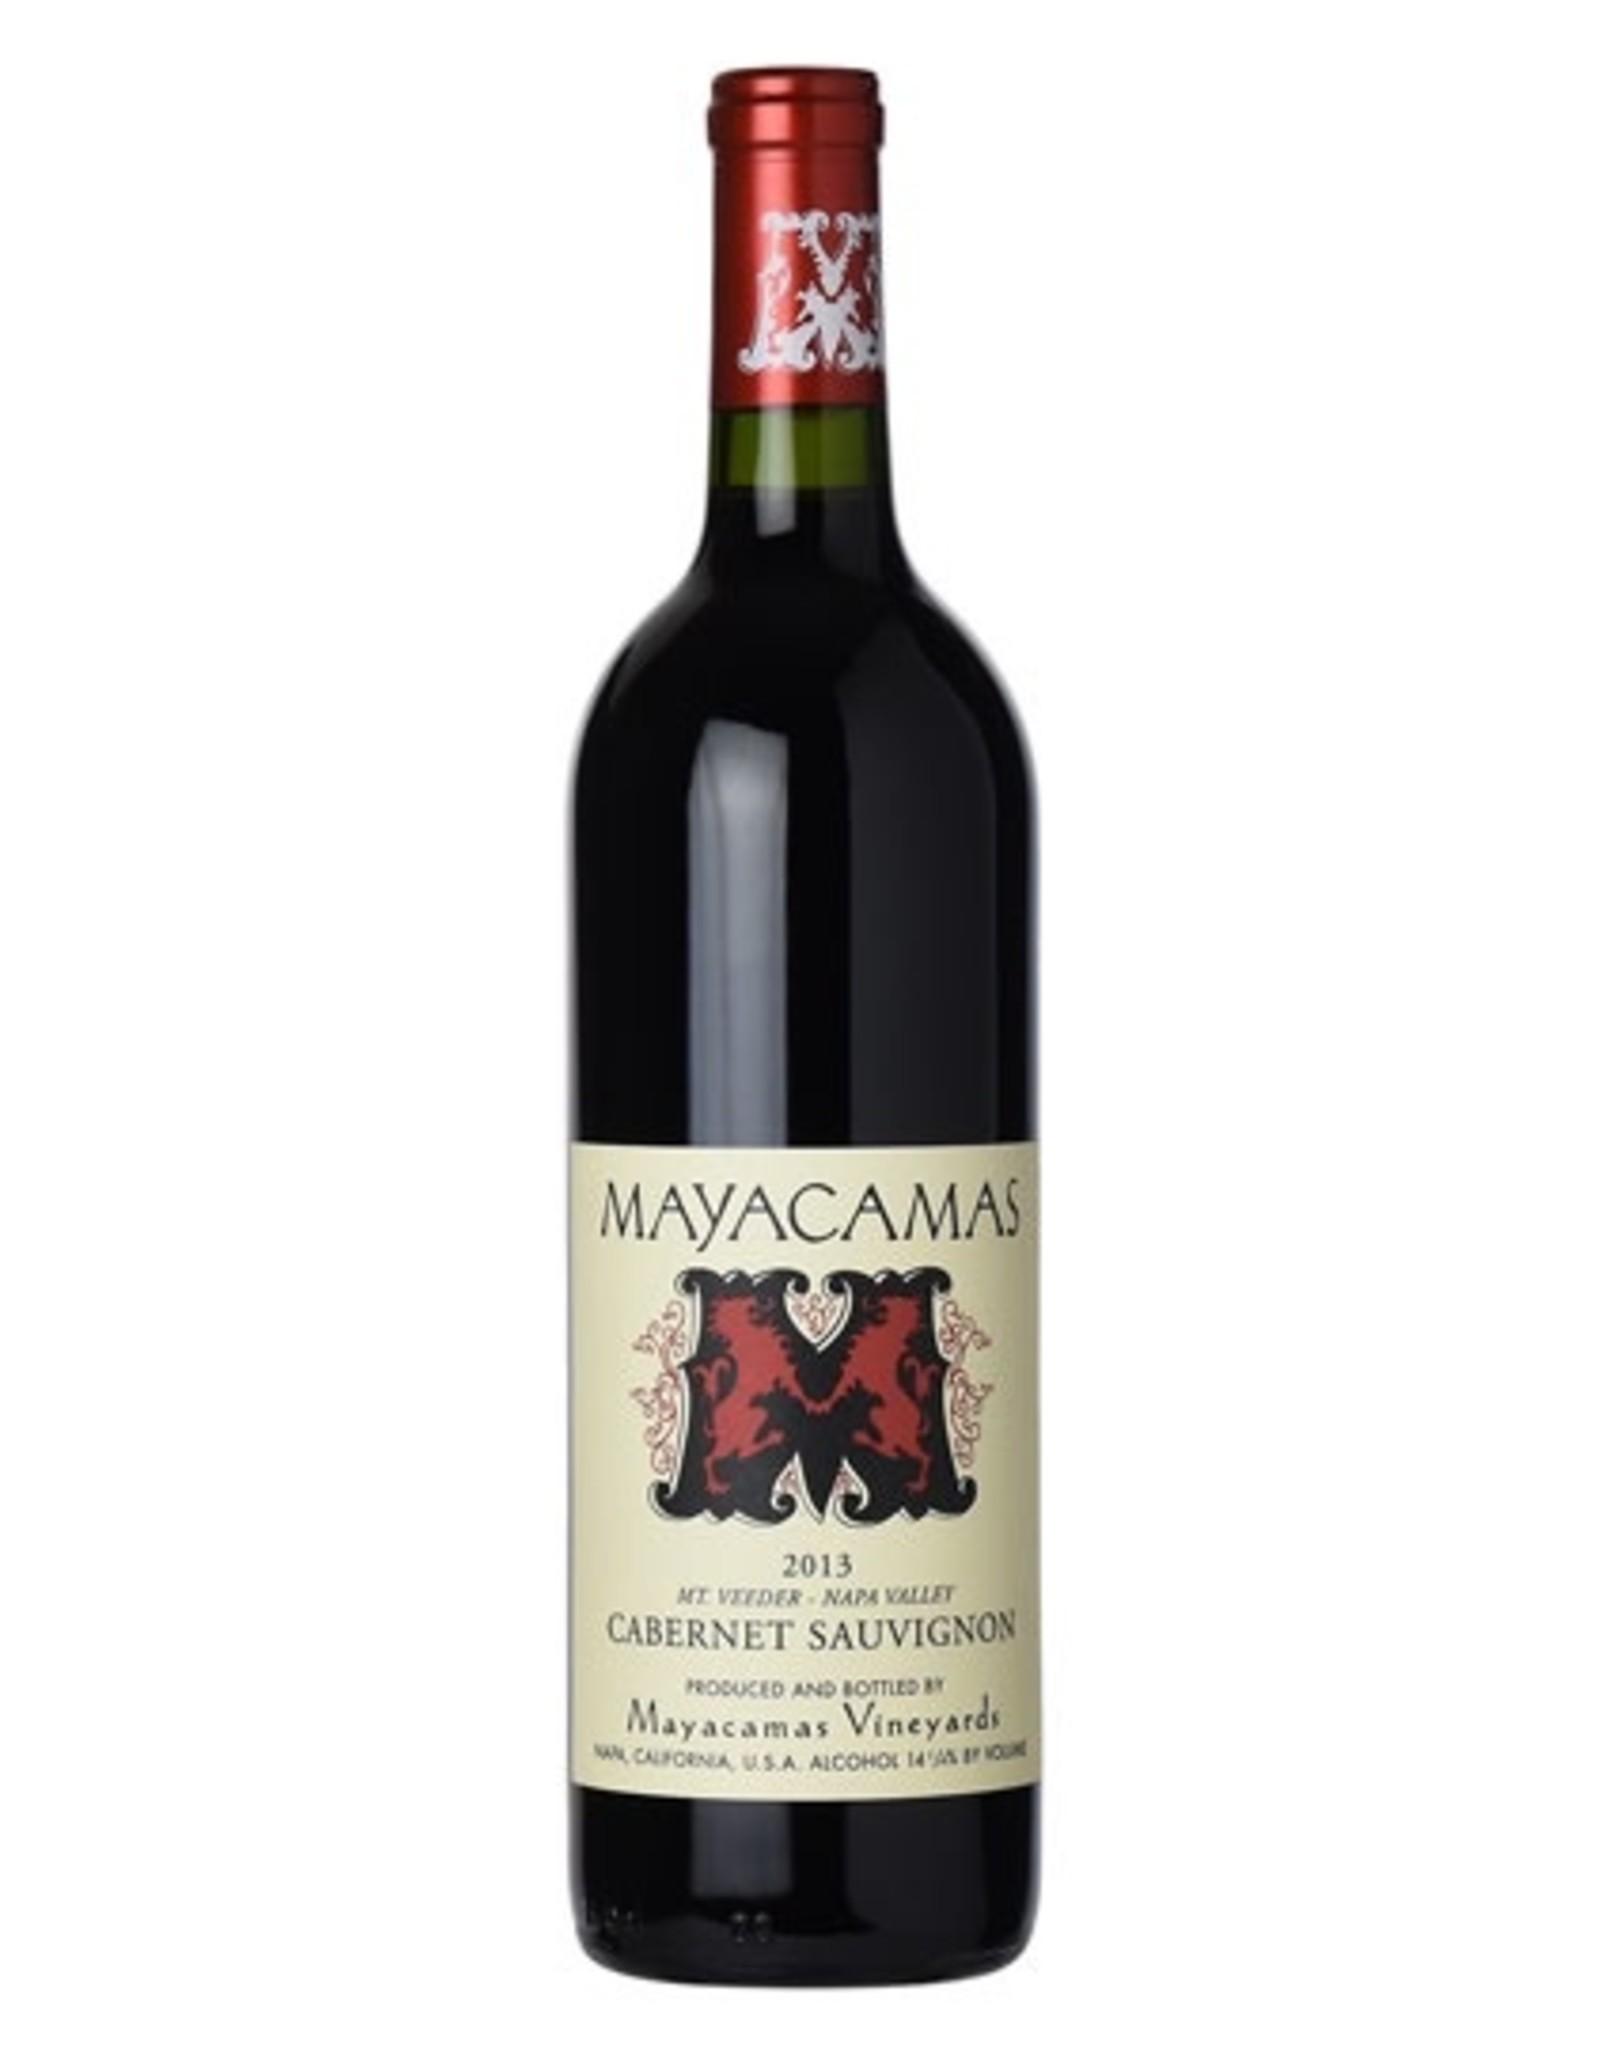 Red Wine 2013, Mayacamas, Cabernet Sauvignon, Mt. Veeder, Napa Valley, California,14.25% Alc, CT91.9, V97, JS95